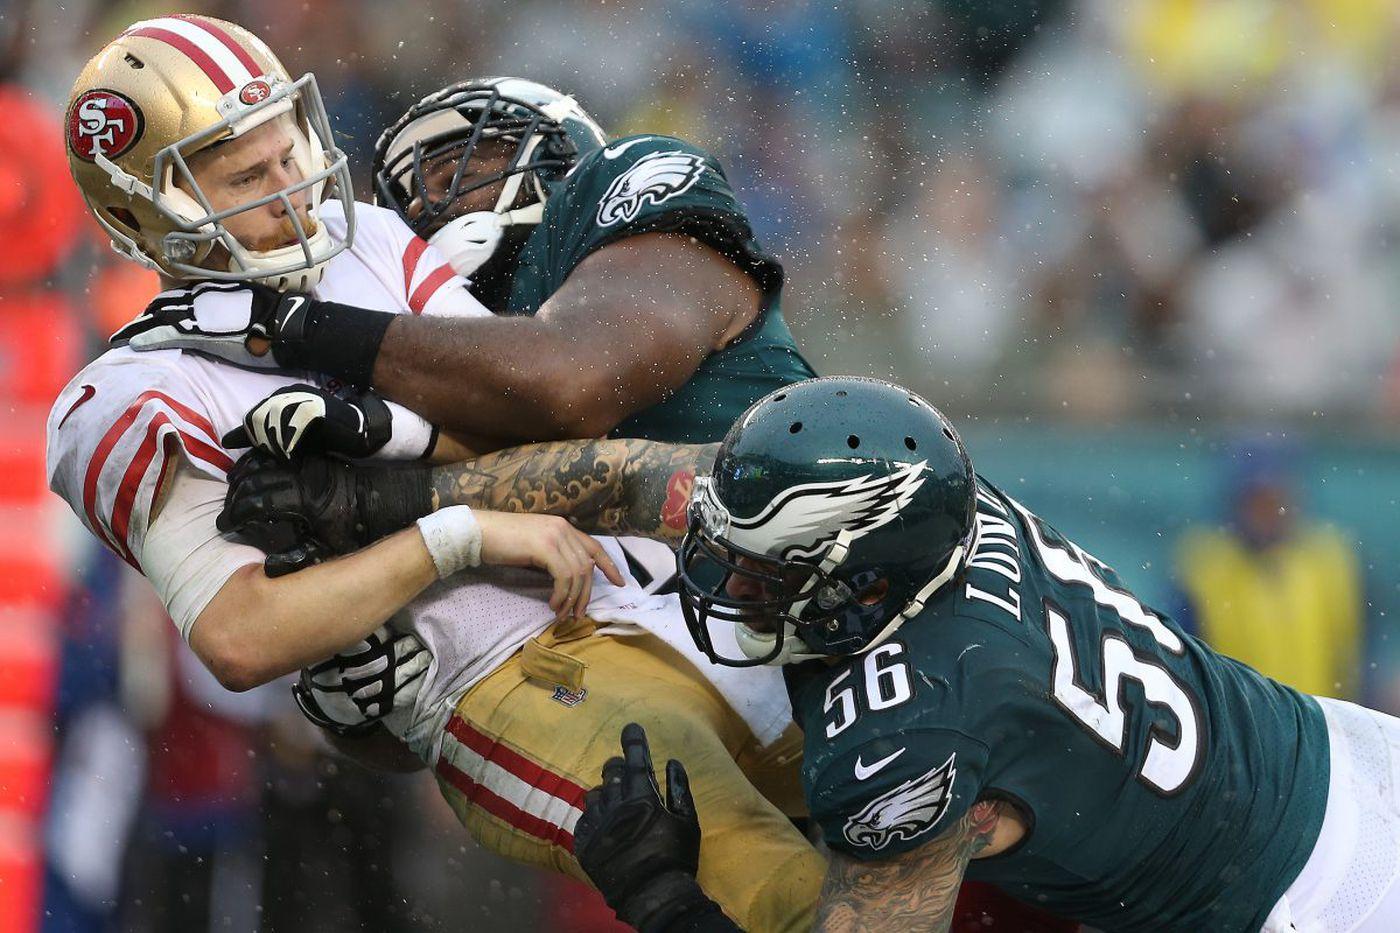 Hard-hitting Eagles defense a big reason for 7-1 start | Early Birds